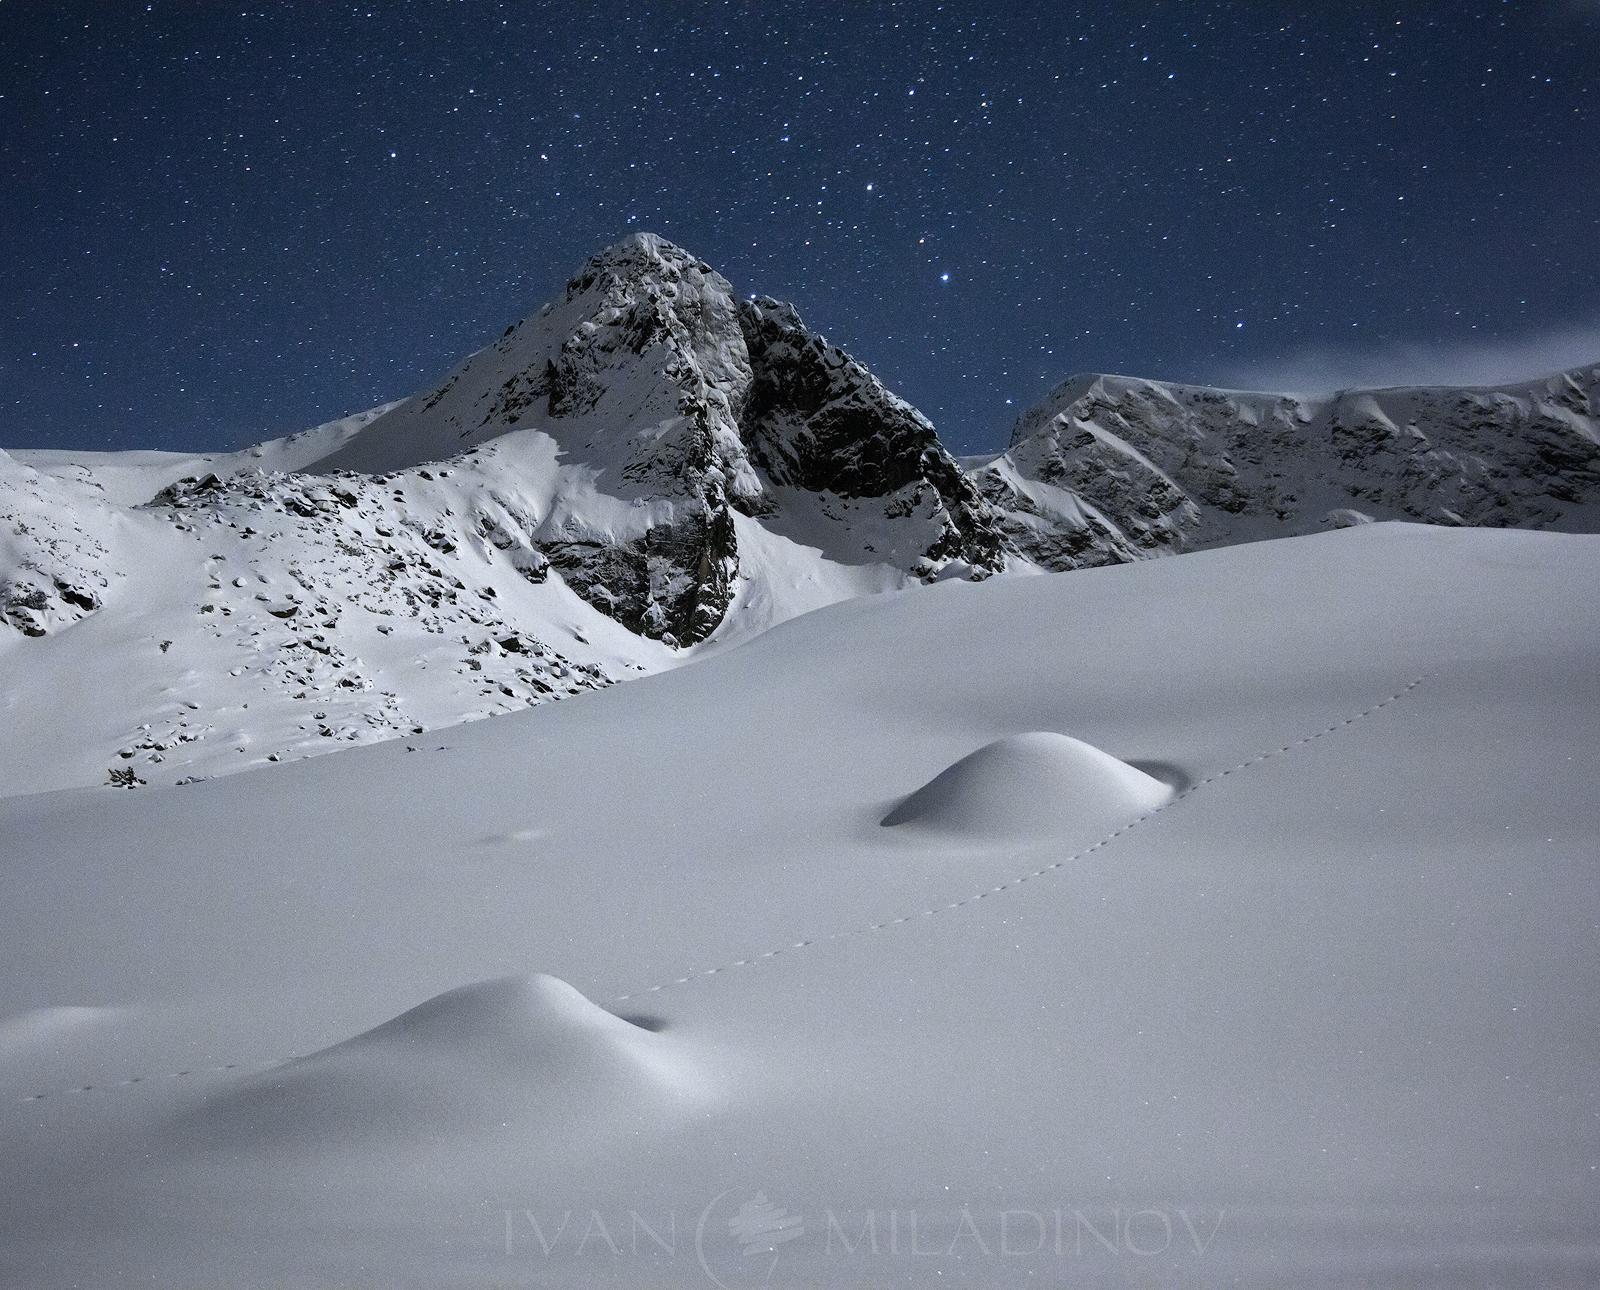 Haramiata peak